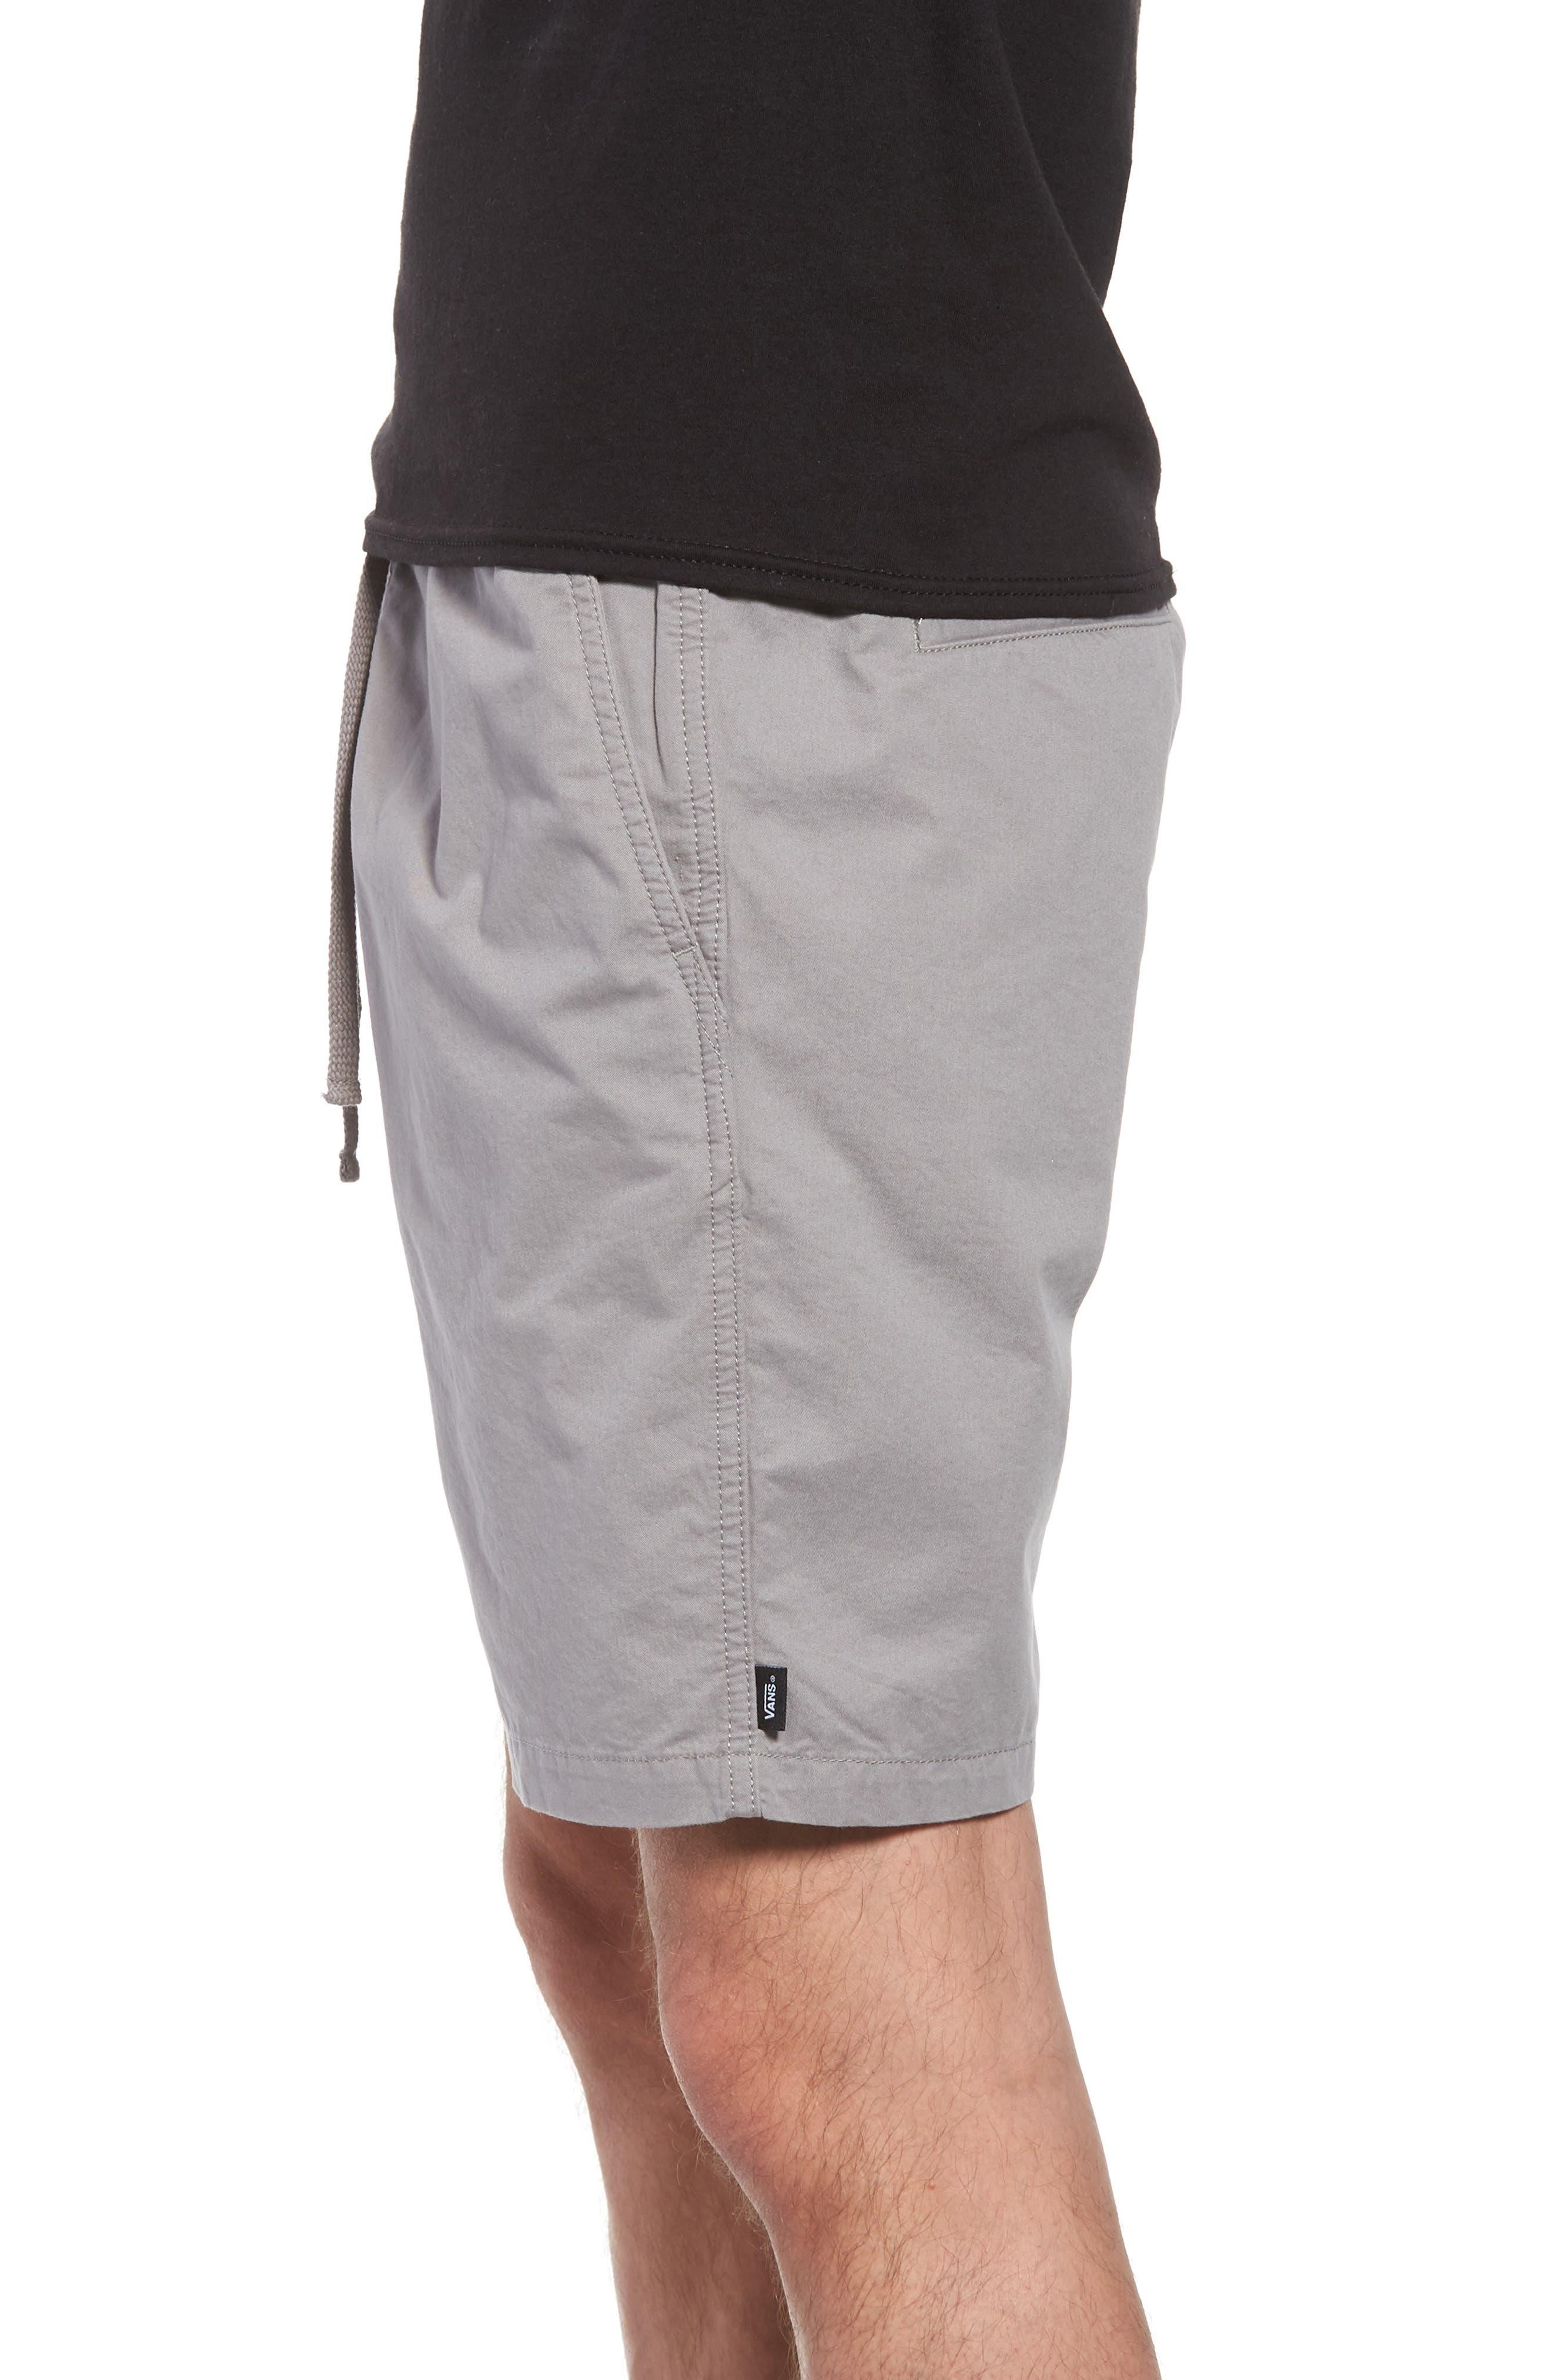 Range Drawstring Shorts,                             Alternate thumbnail 3, color,                             Frost Grey